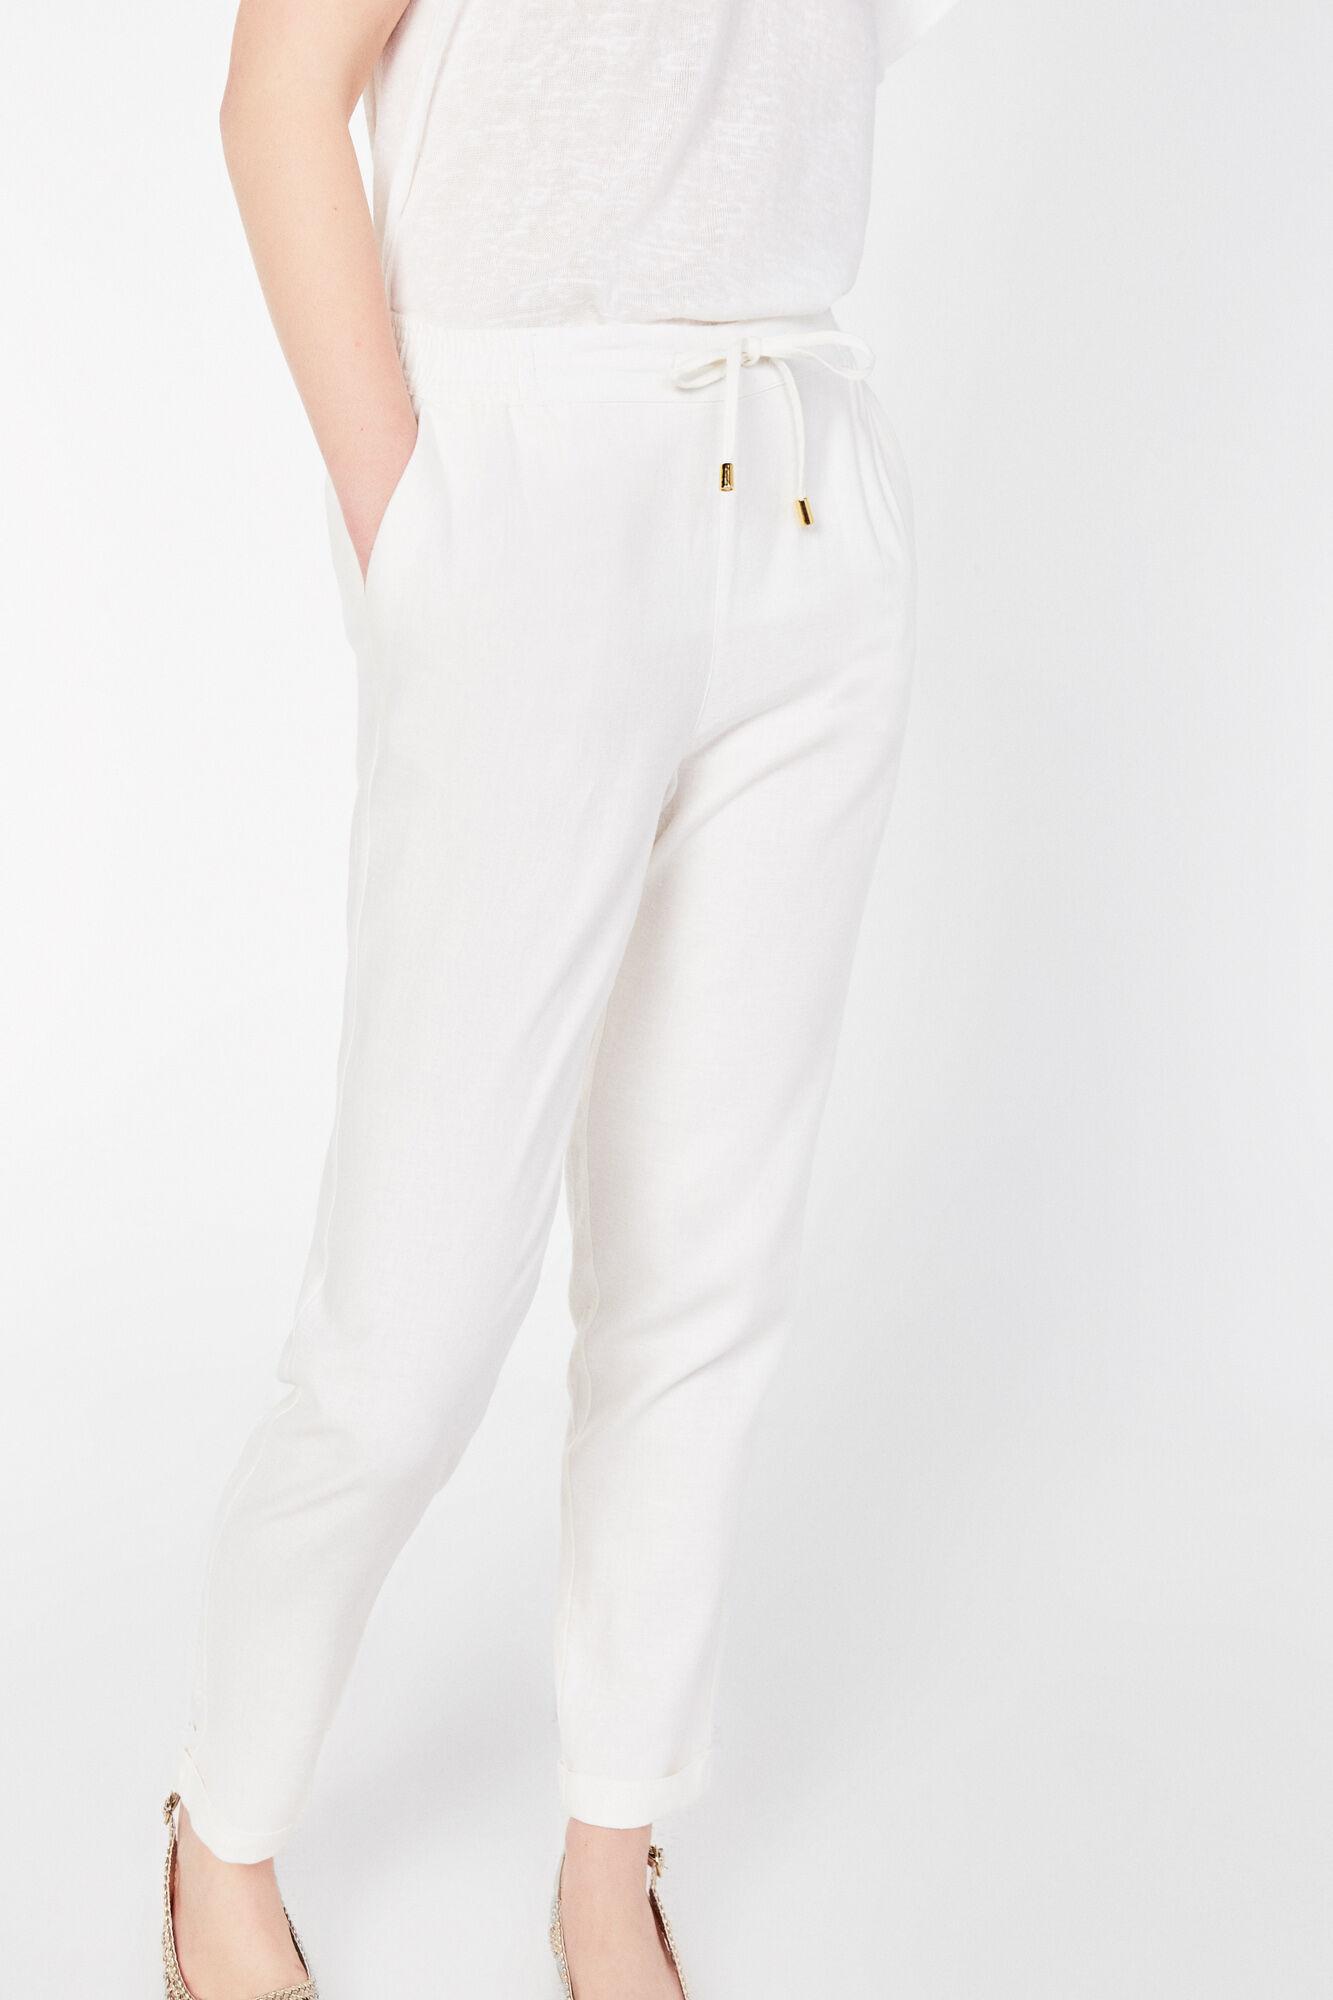 Pantalon - Femme, Beige, 40Cortefiel